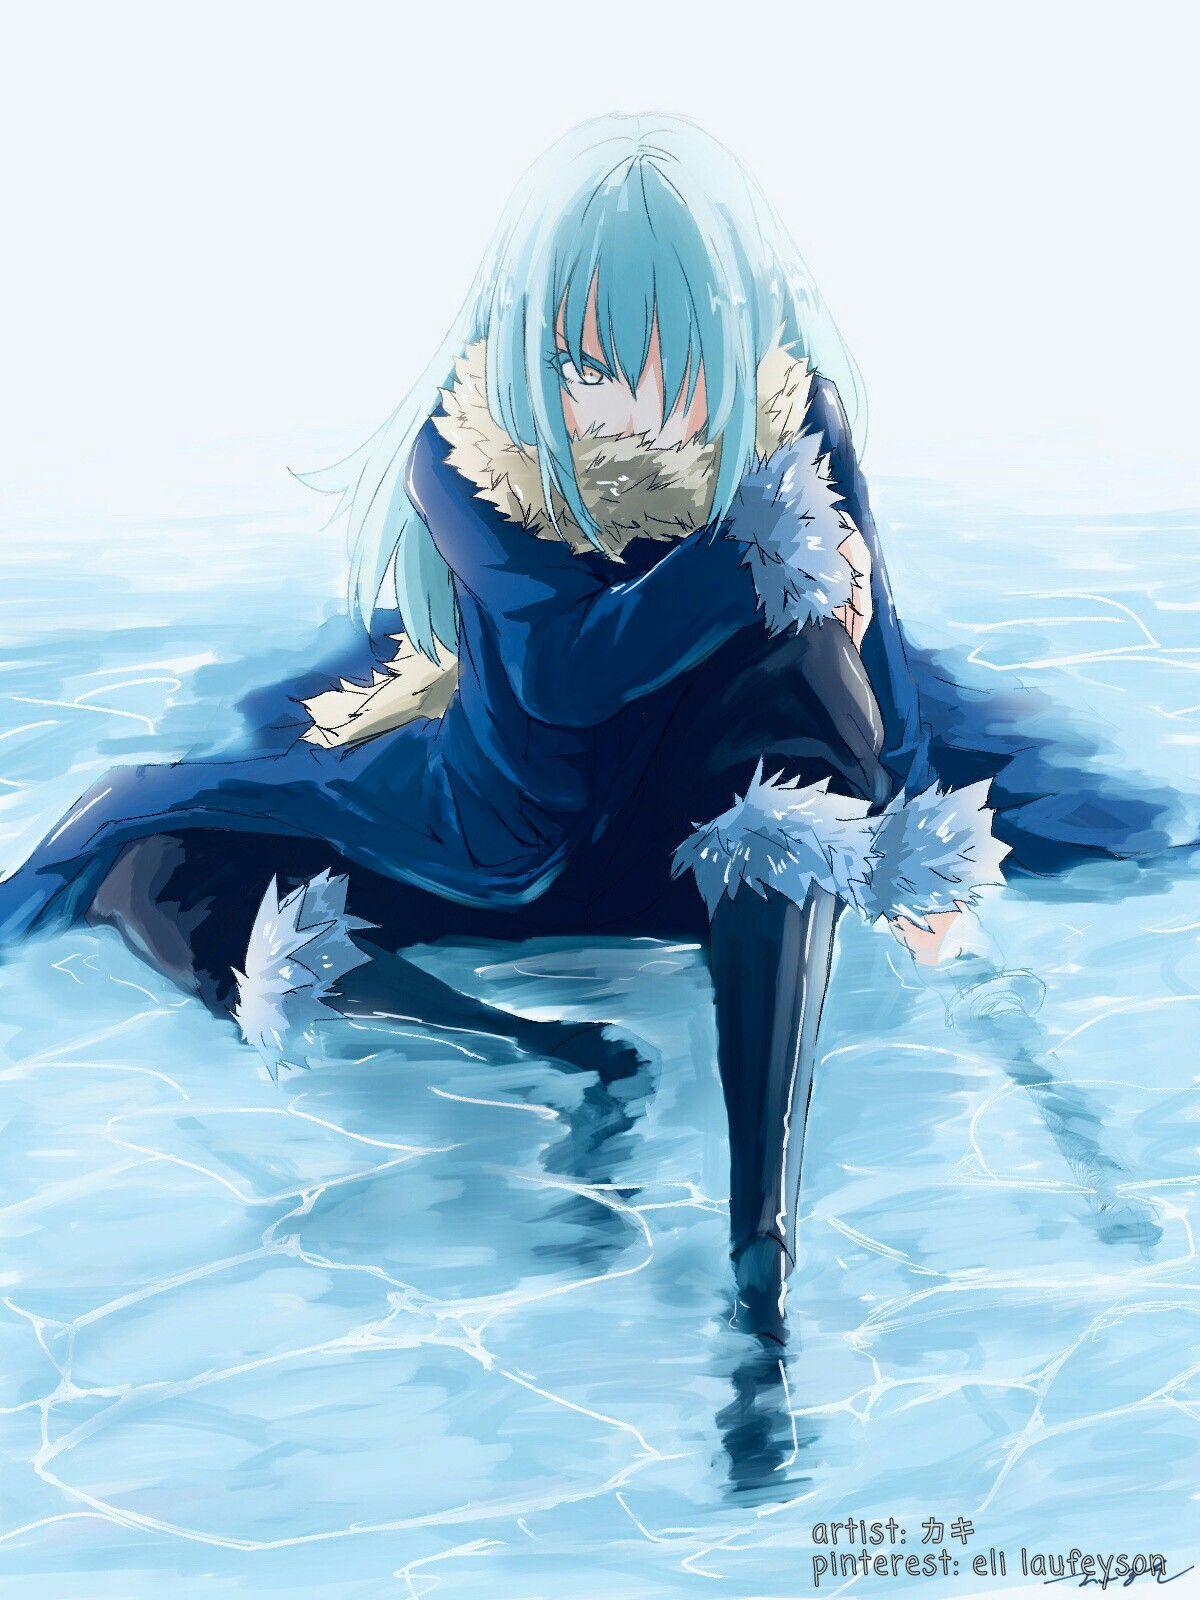 Tensei Shitara Slime Datta Ken By カキ Art And Photography